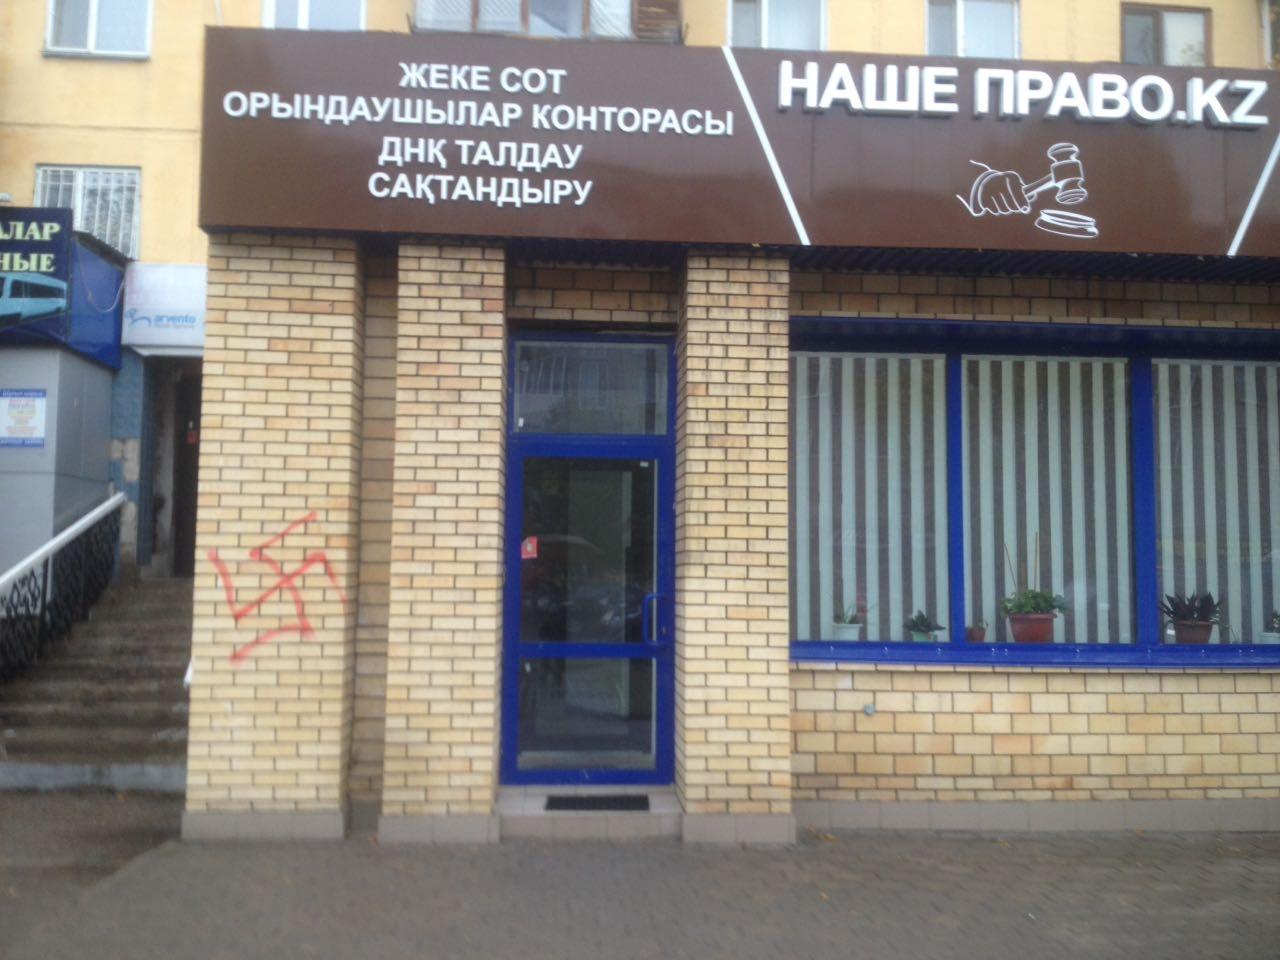 Вандалы нарисовали свастику на фасаде здания